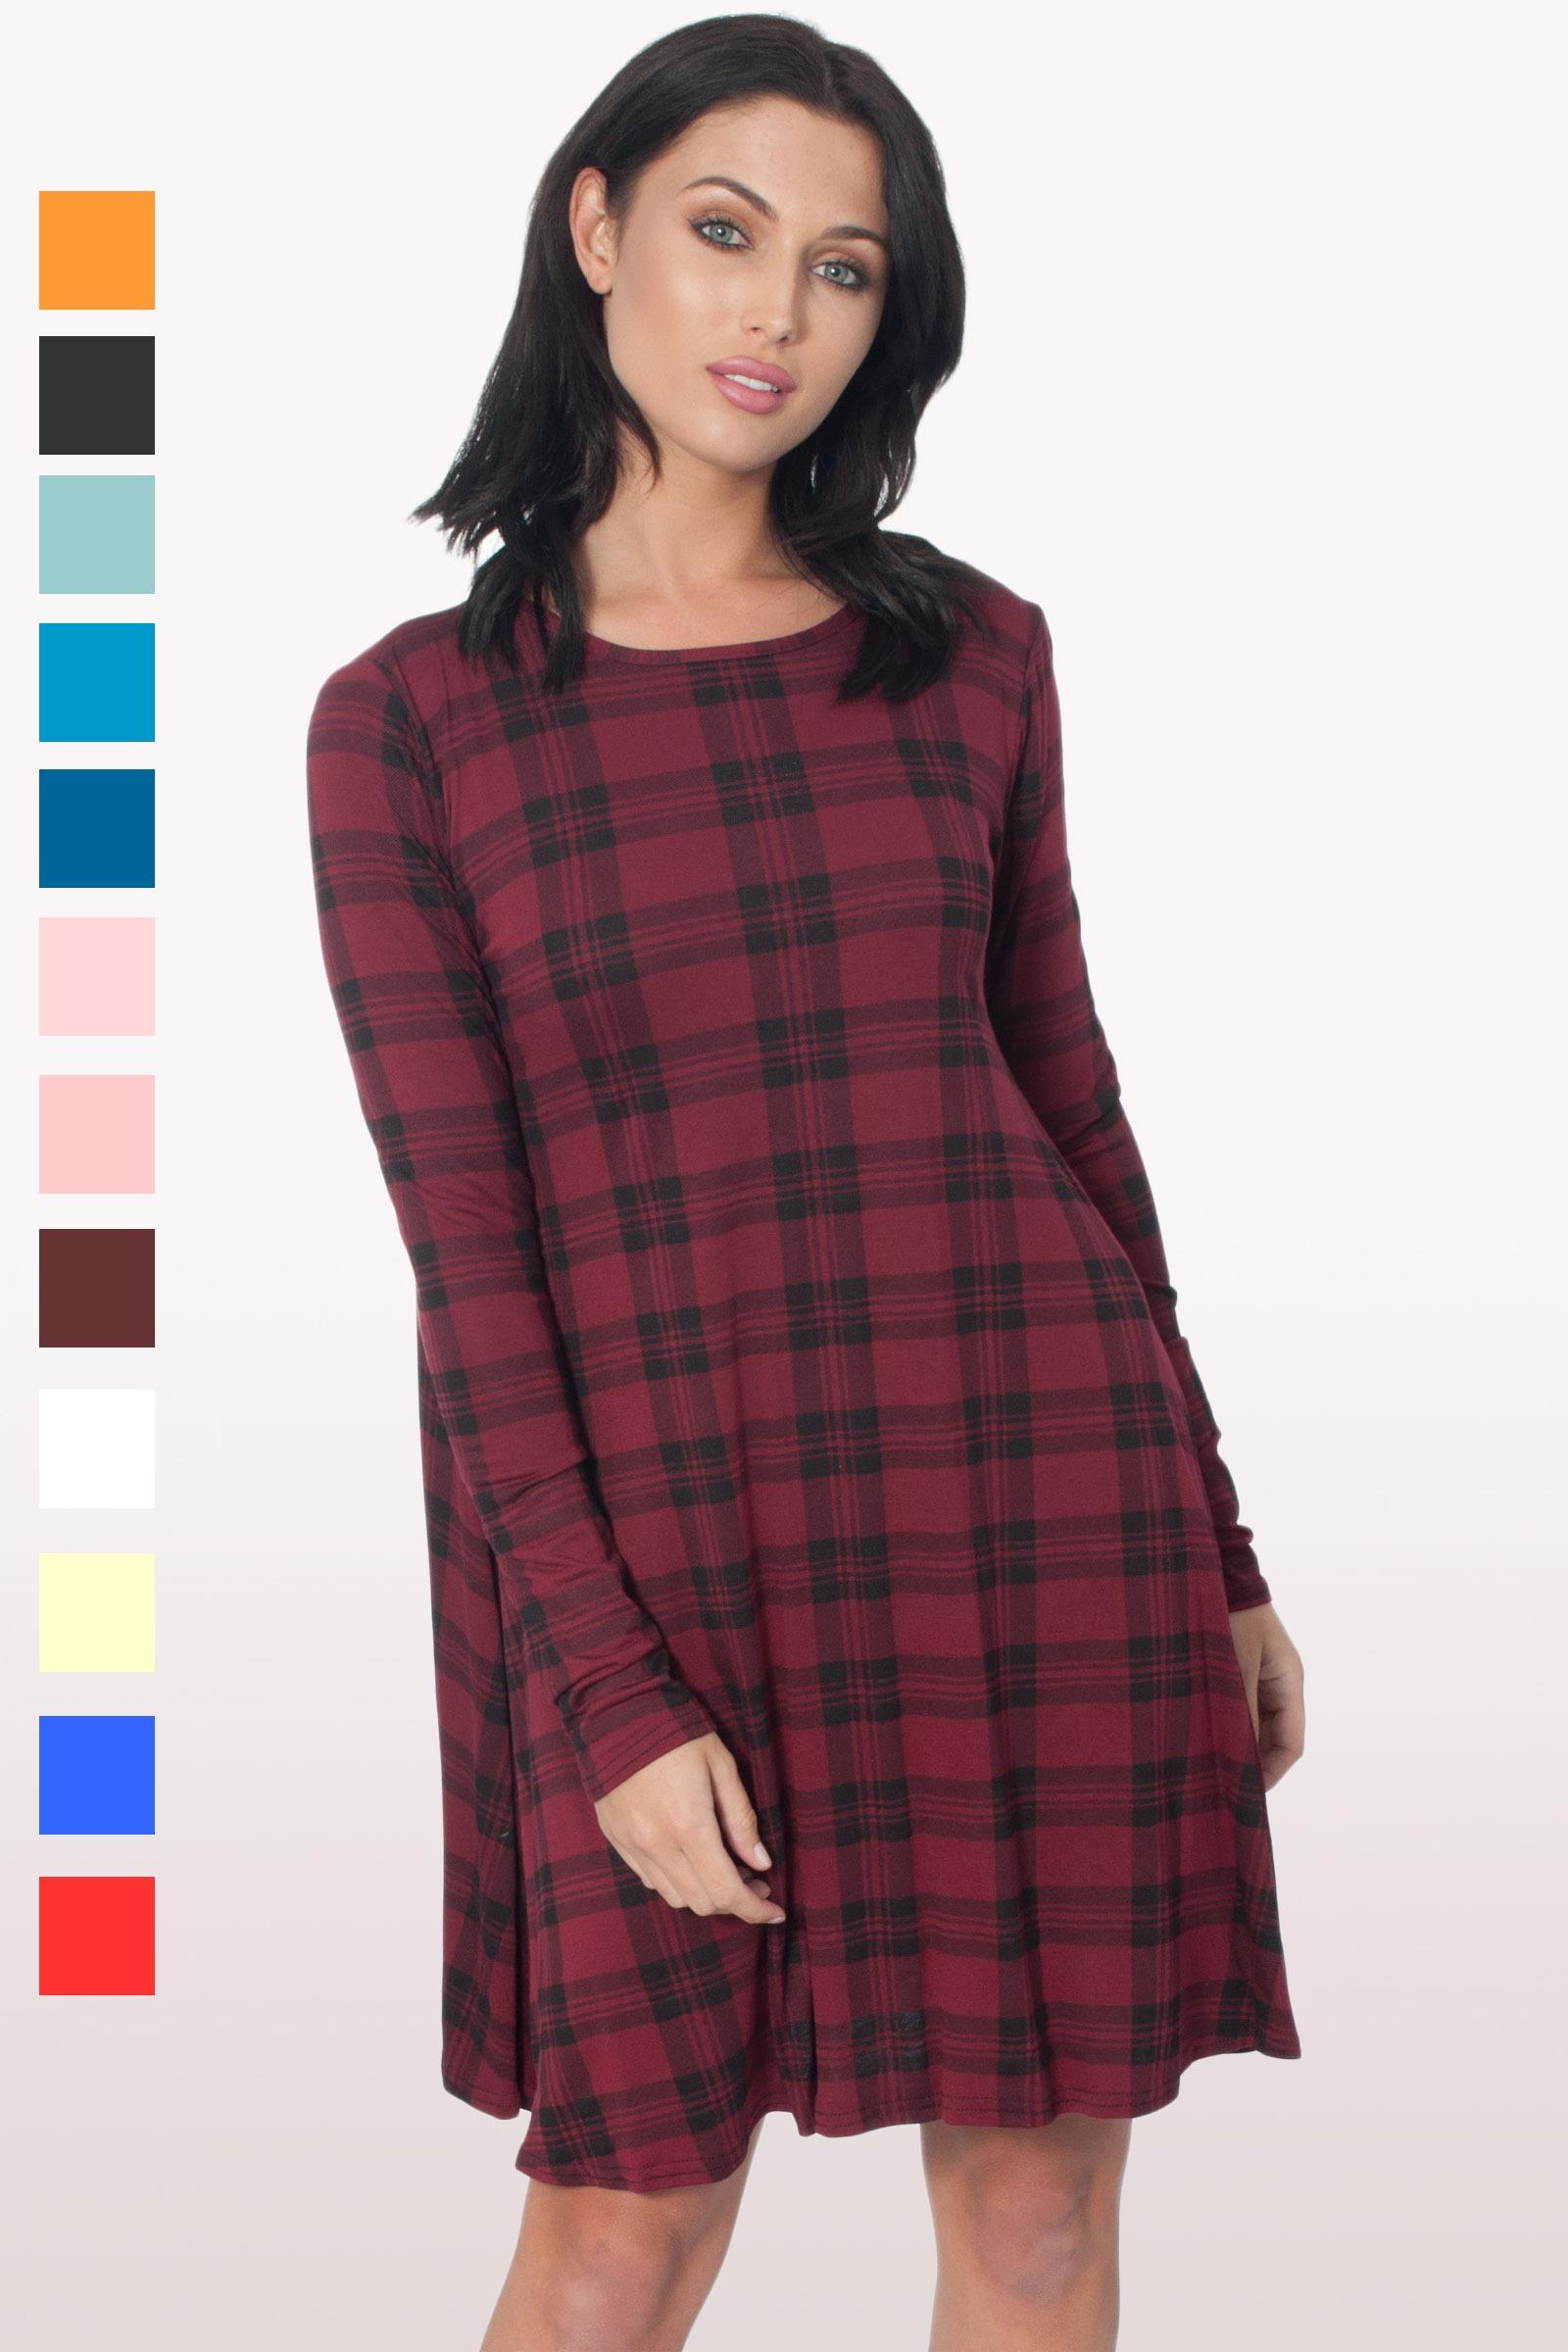 622ef6a69285 Briella Long Sleeve Swing Dress